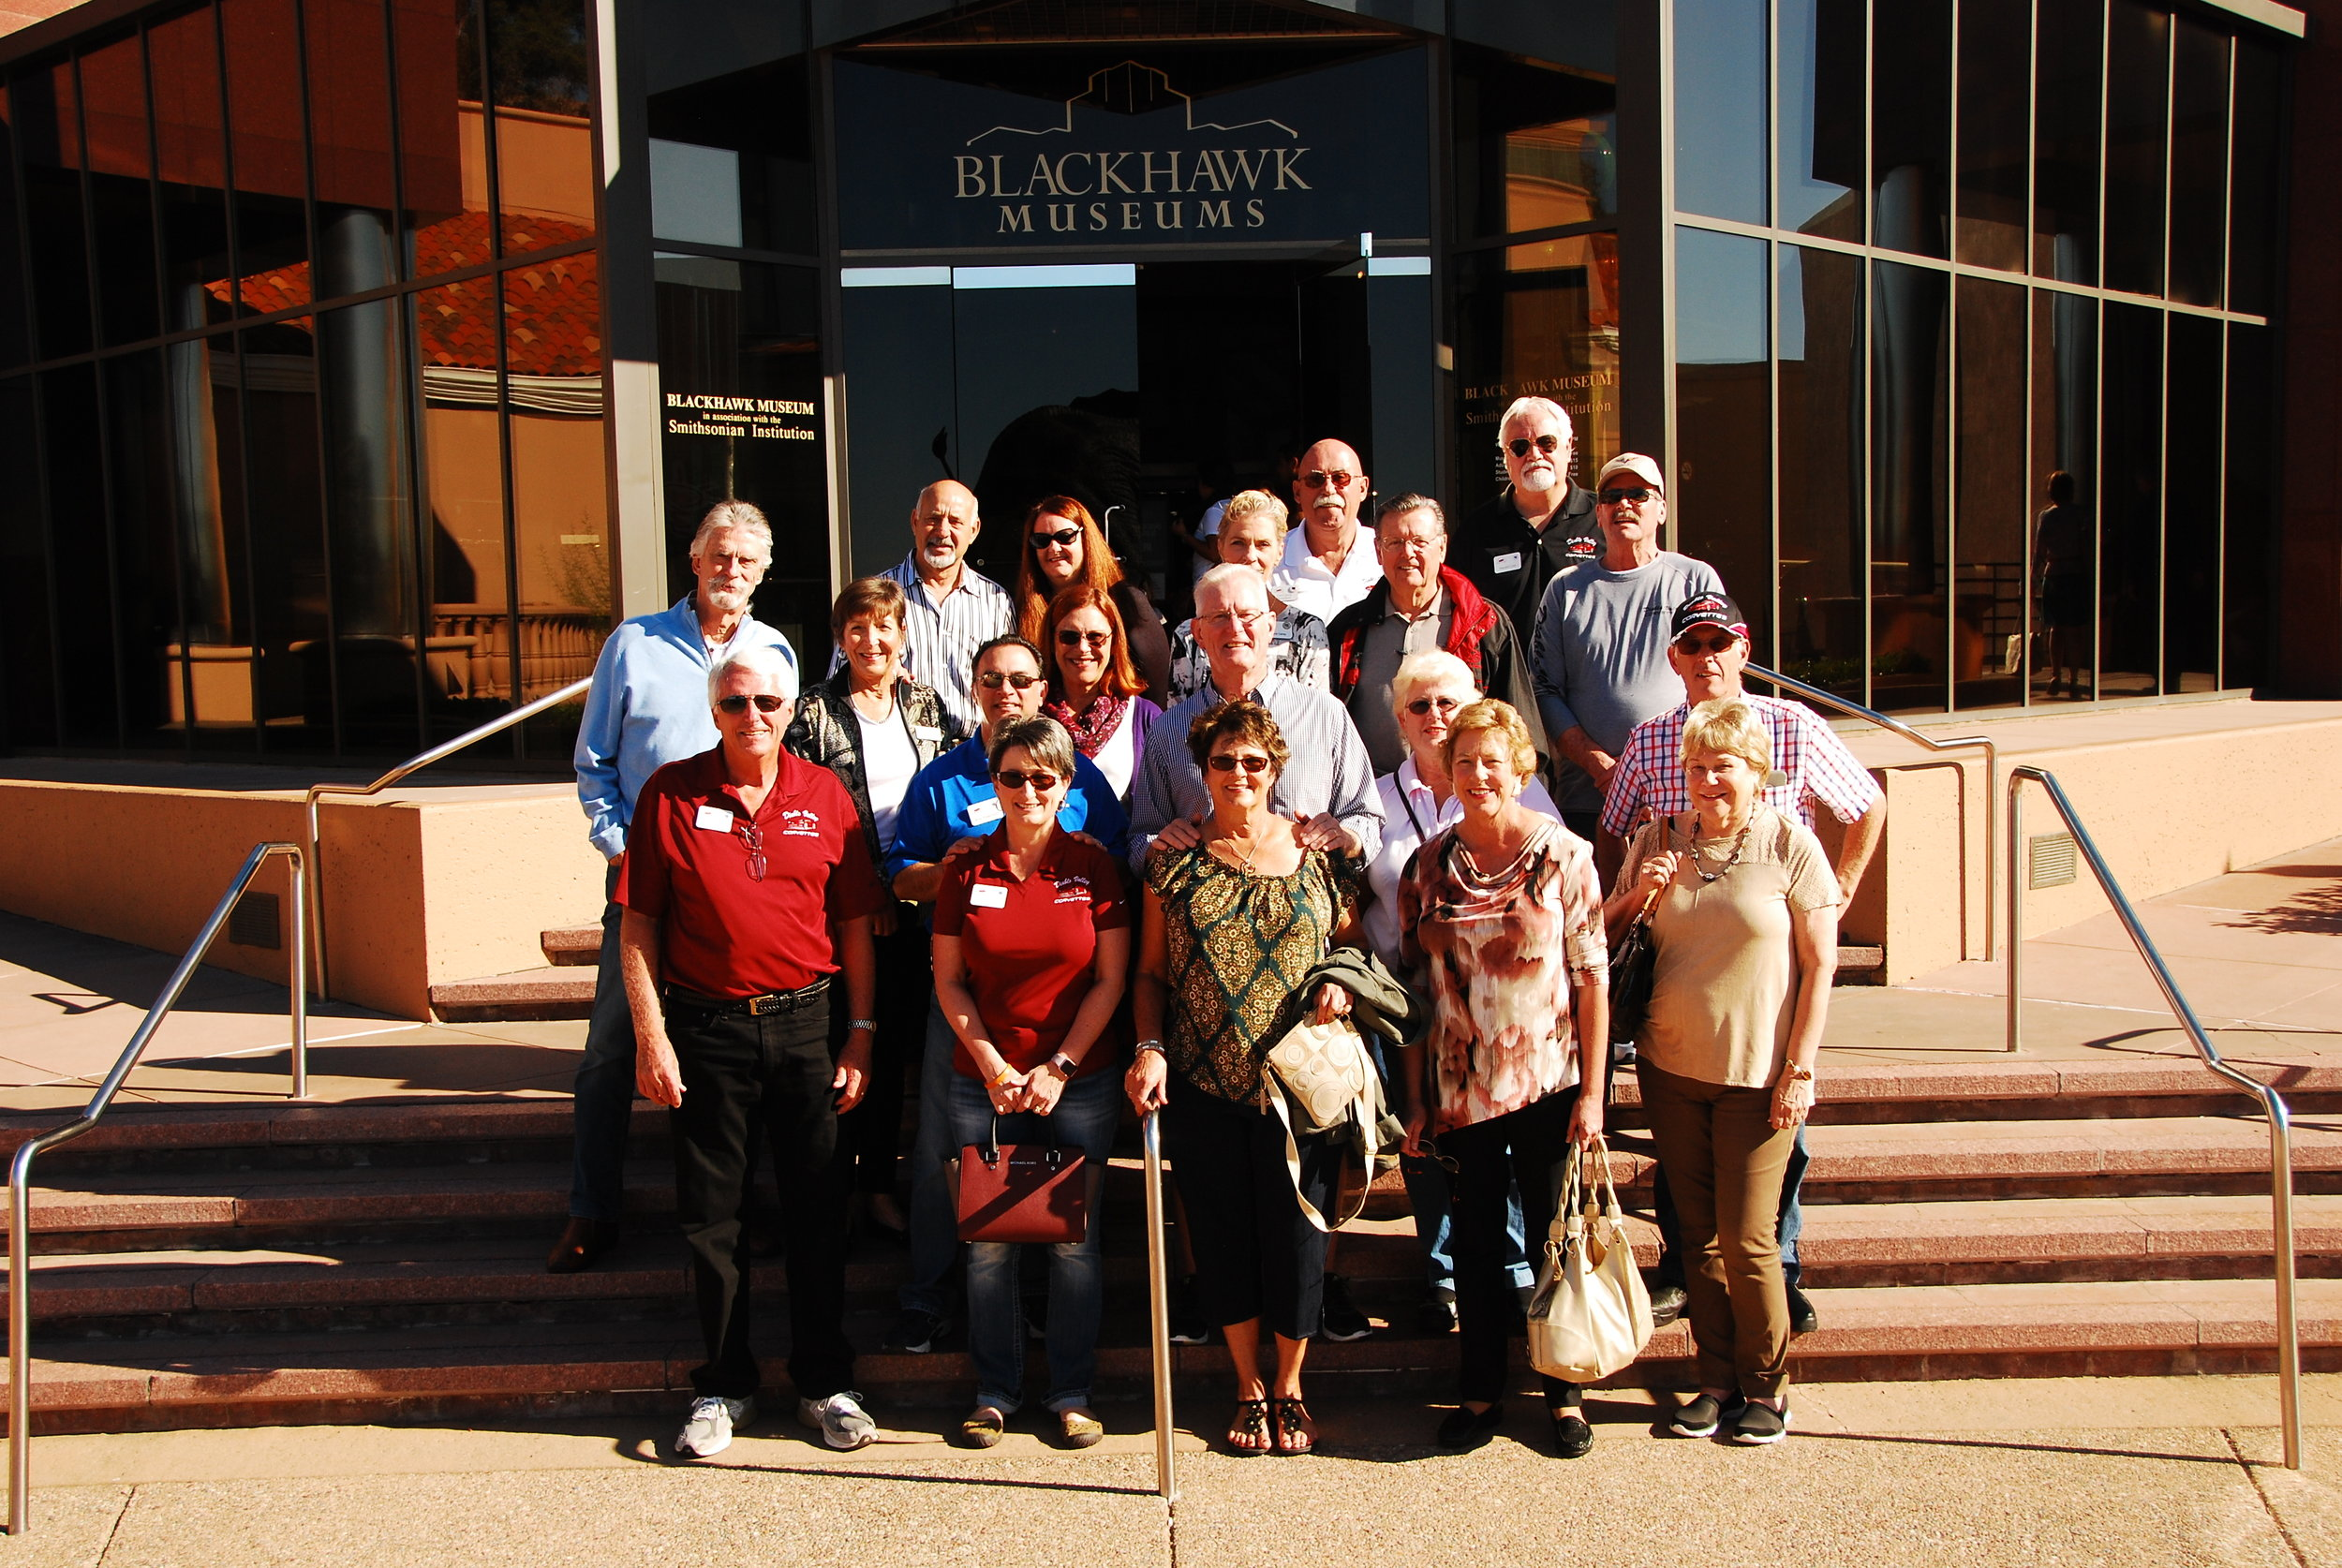 Blackhawk Museum Spirit of the Old West Tour